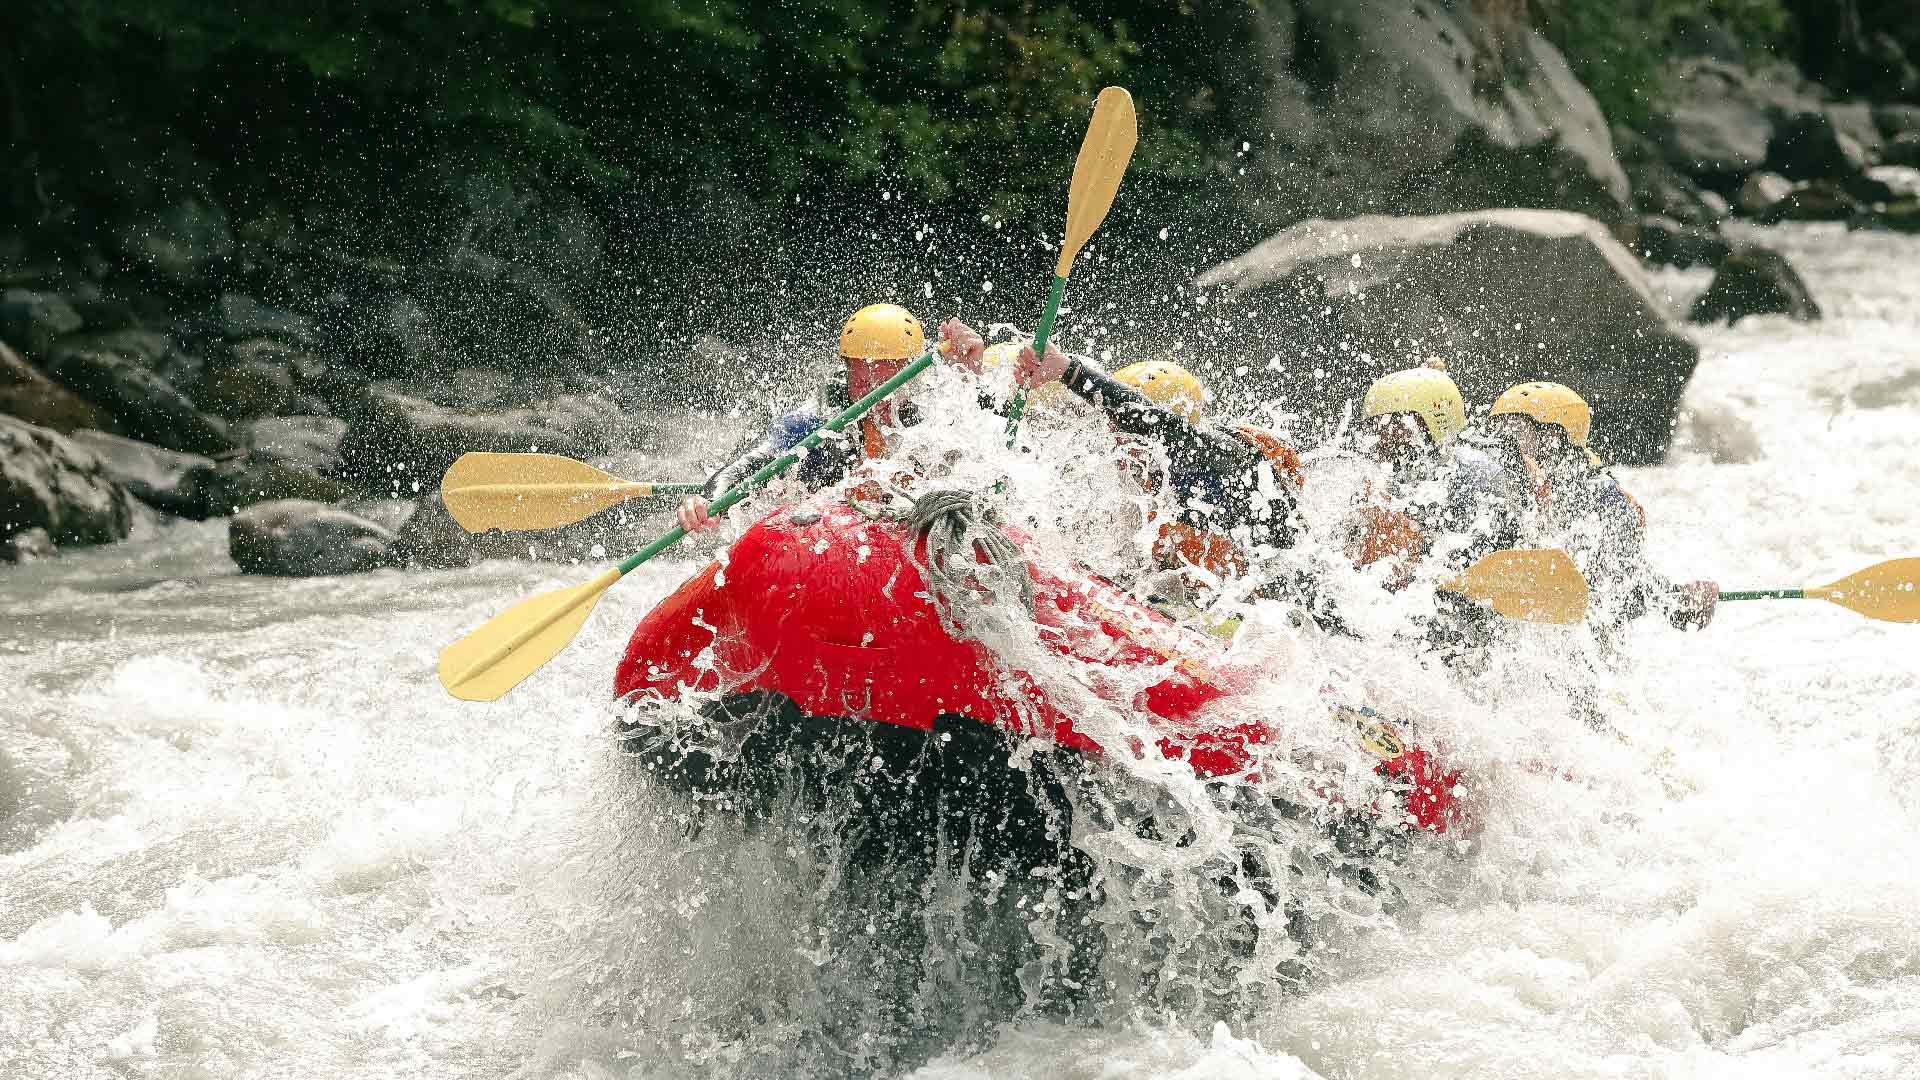 river-rafting-sommer-adventure-action-wasser